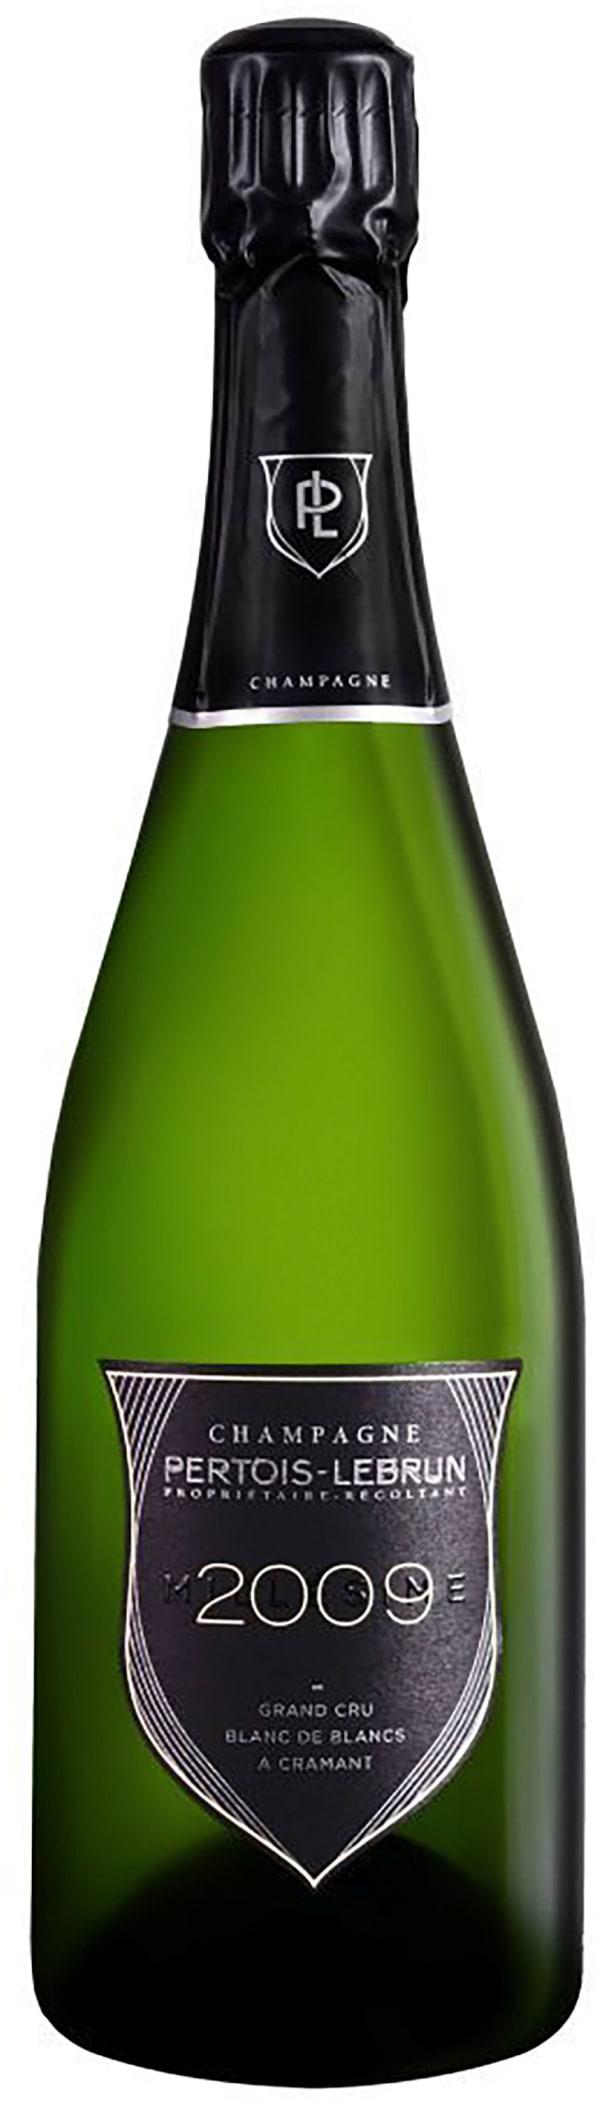 Pertois-Lebrun Millésime Grand Cru Blanc de Blancs à Cramant Champagne Extra-Brut 2009